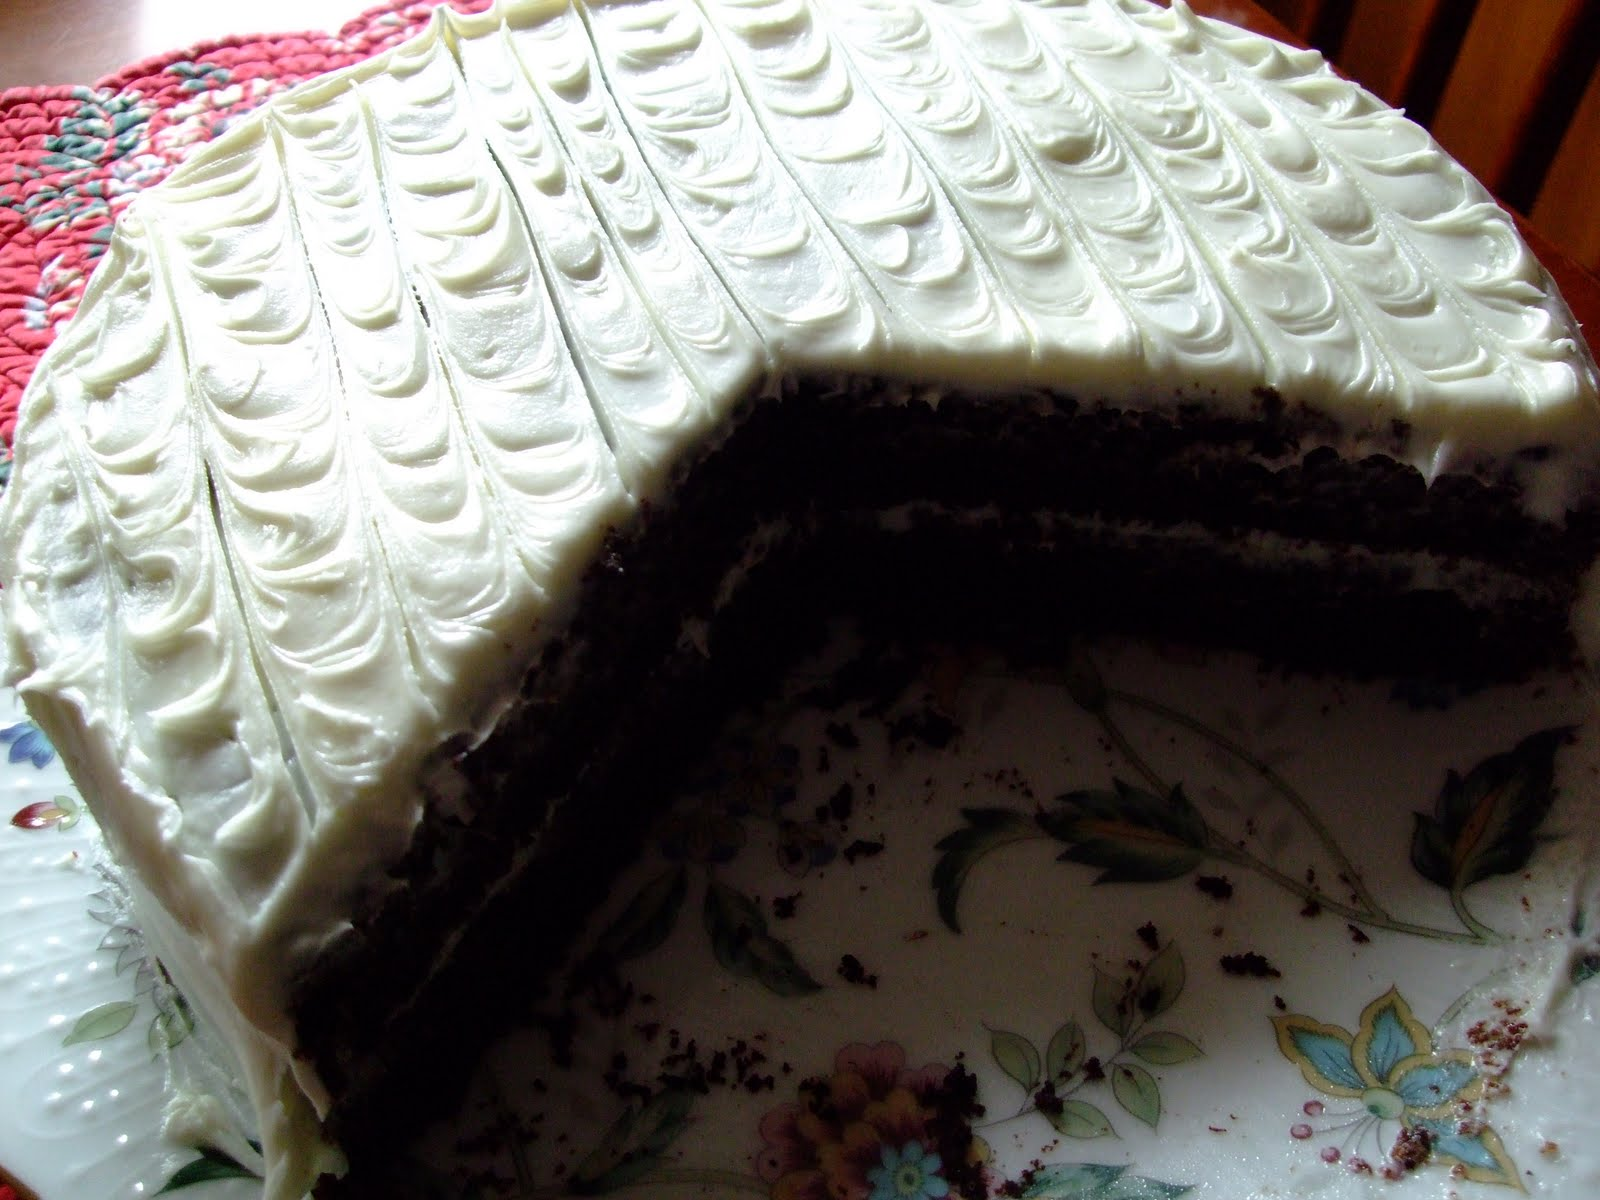 Learning to Eat AllergyFree King Arthur GlutenFree Chocolate Cake Mix